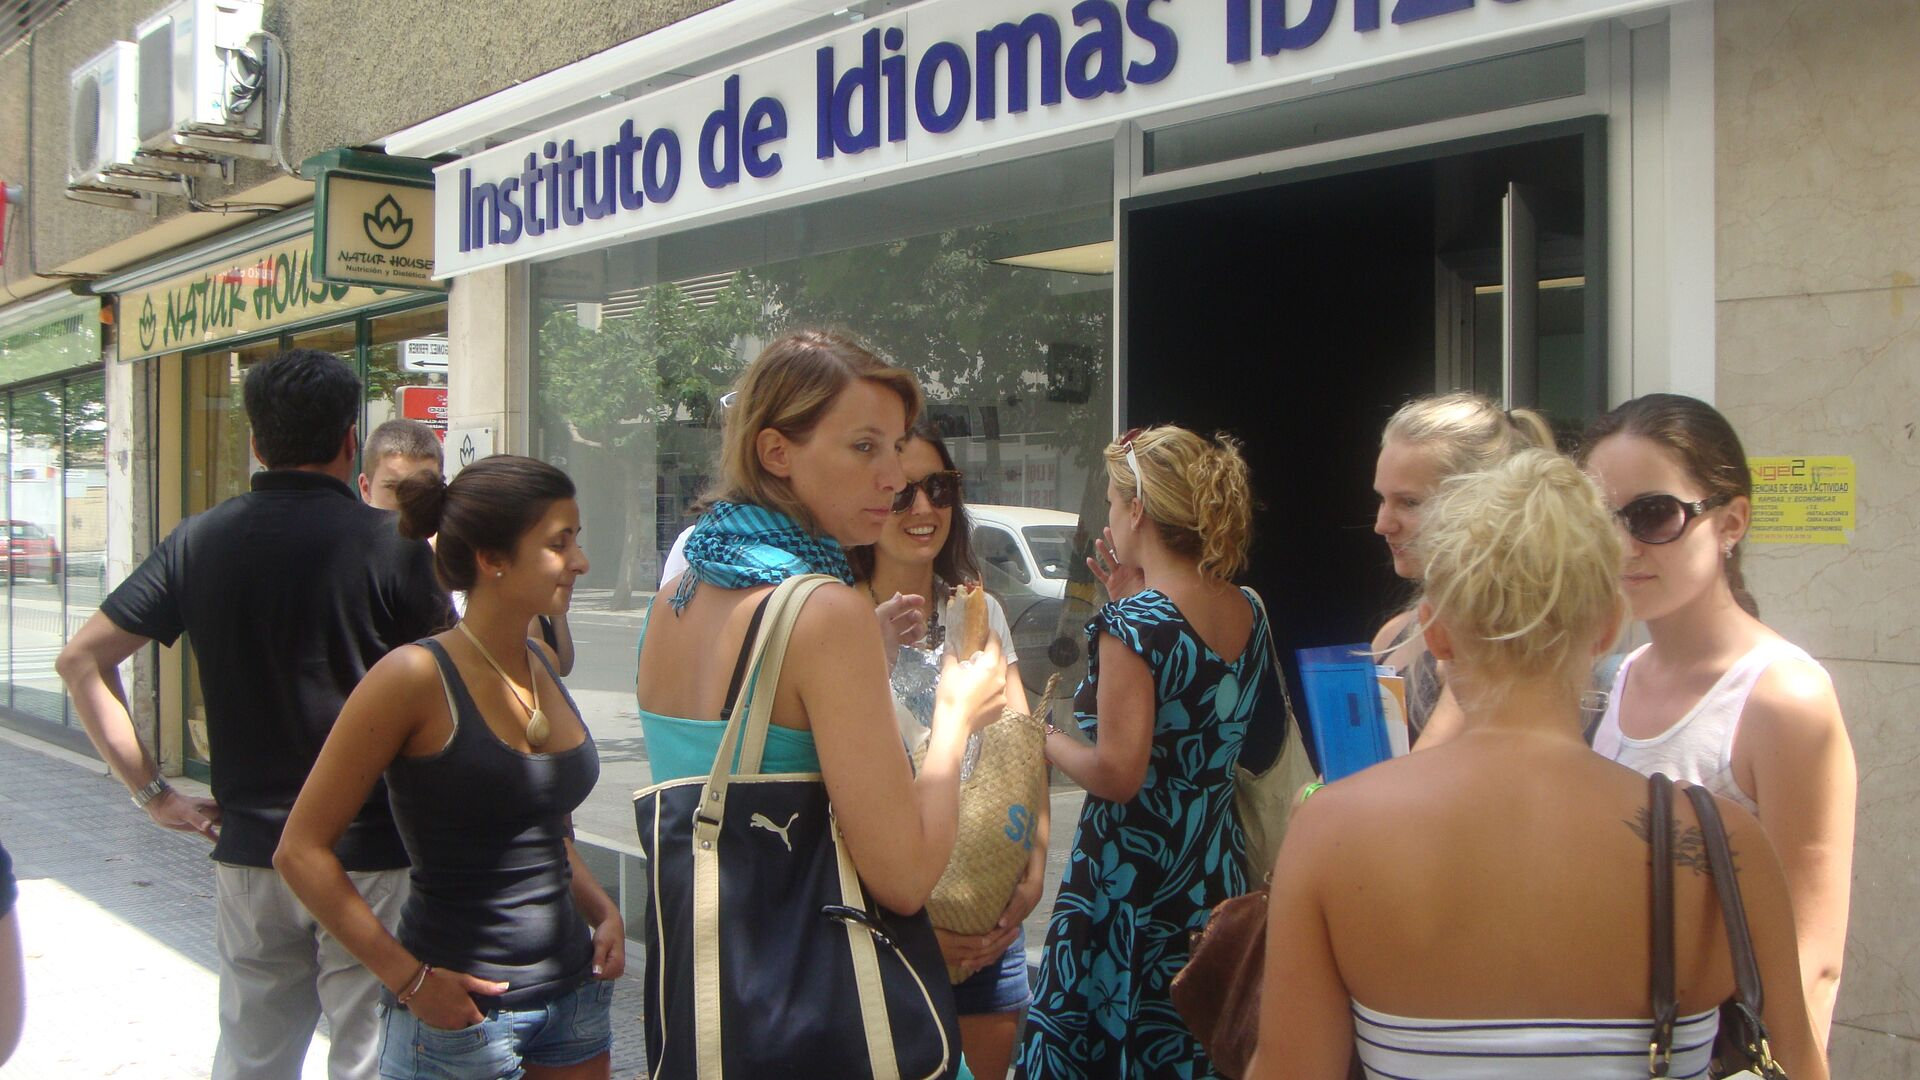 Sprachaufenthalt Spanien, Ibiza - Instituto de Idiomas Ibiza - Schule